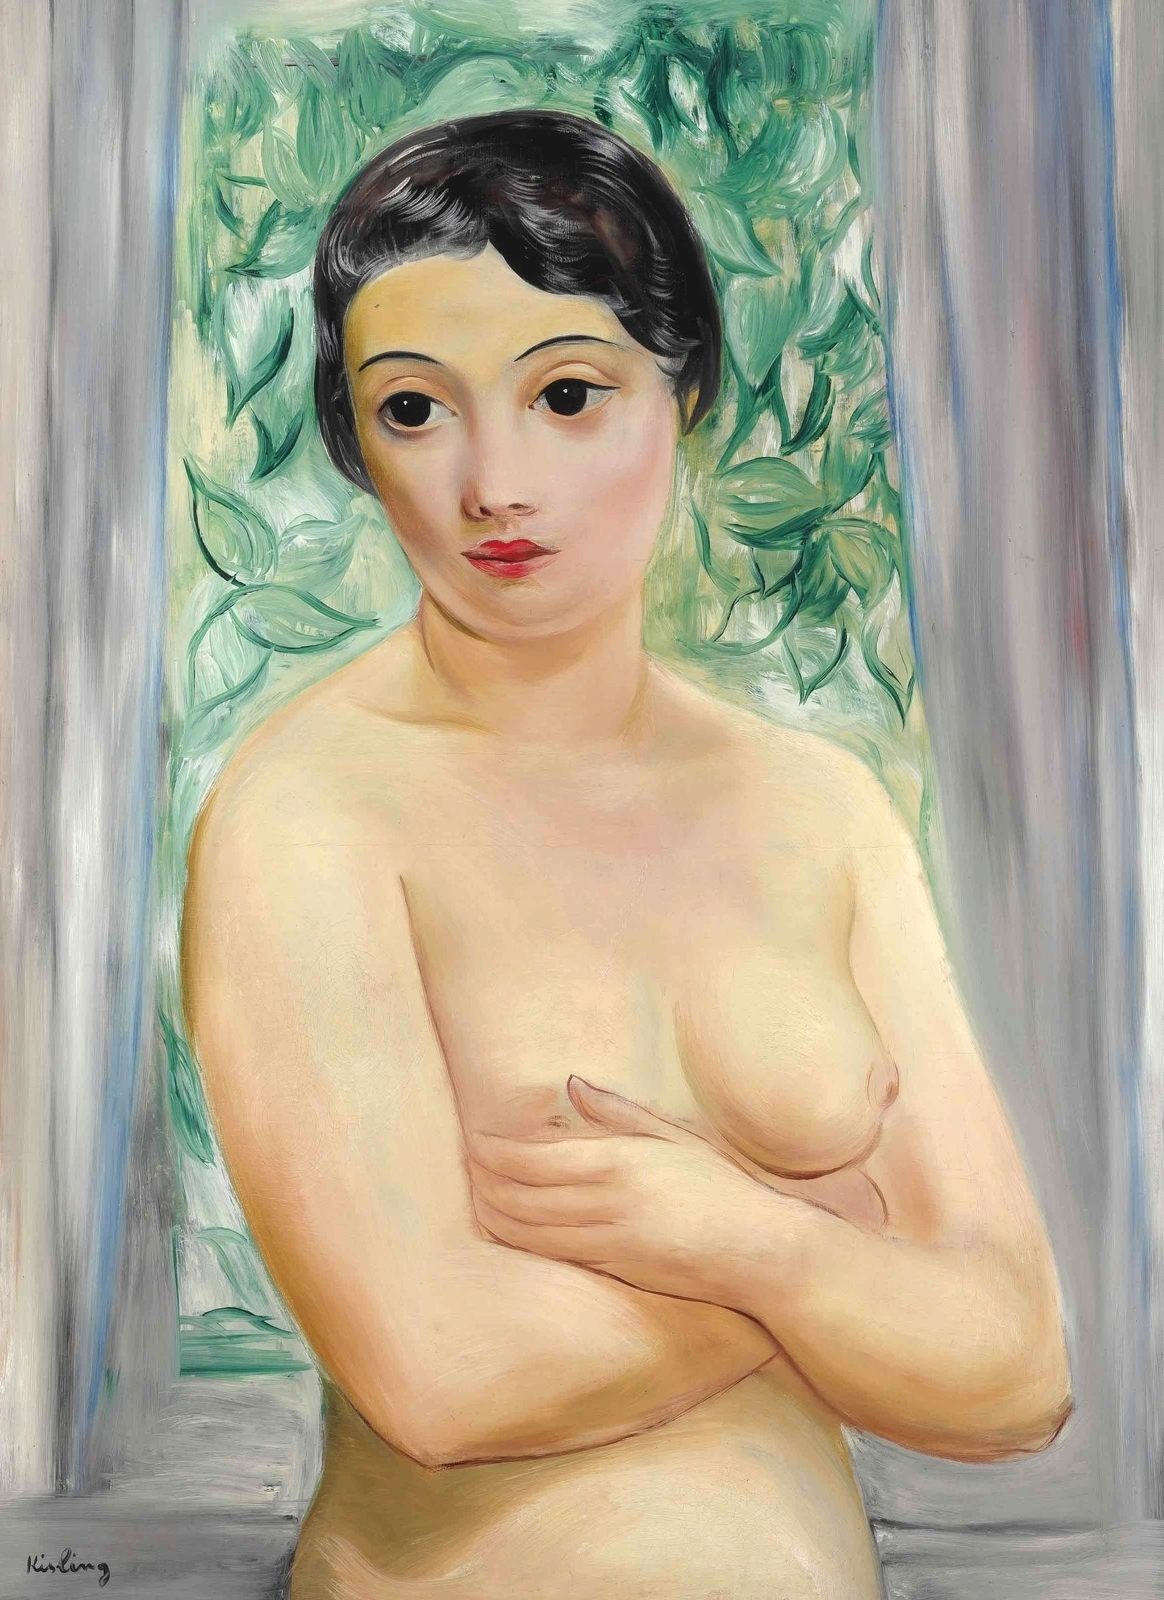 Моисей Кислинг. 1928. Кэтрин (Catherine).  81.3 x 60. Холст, масло. Частное собрание.